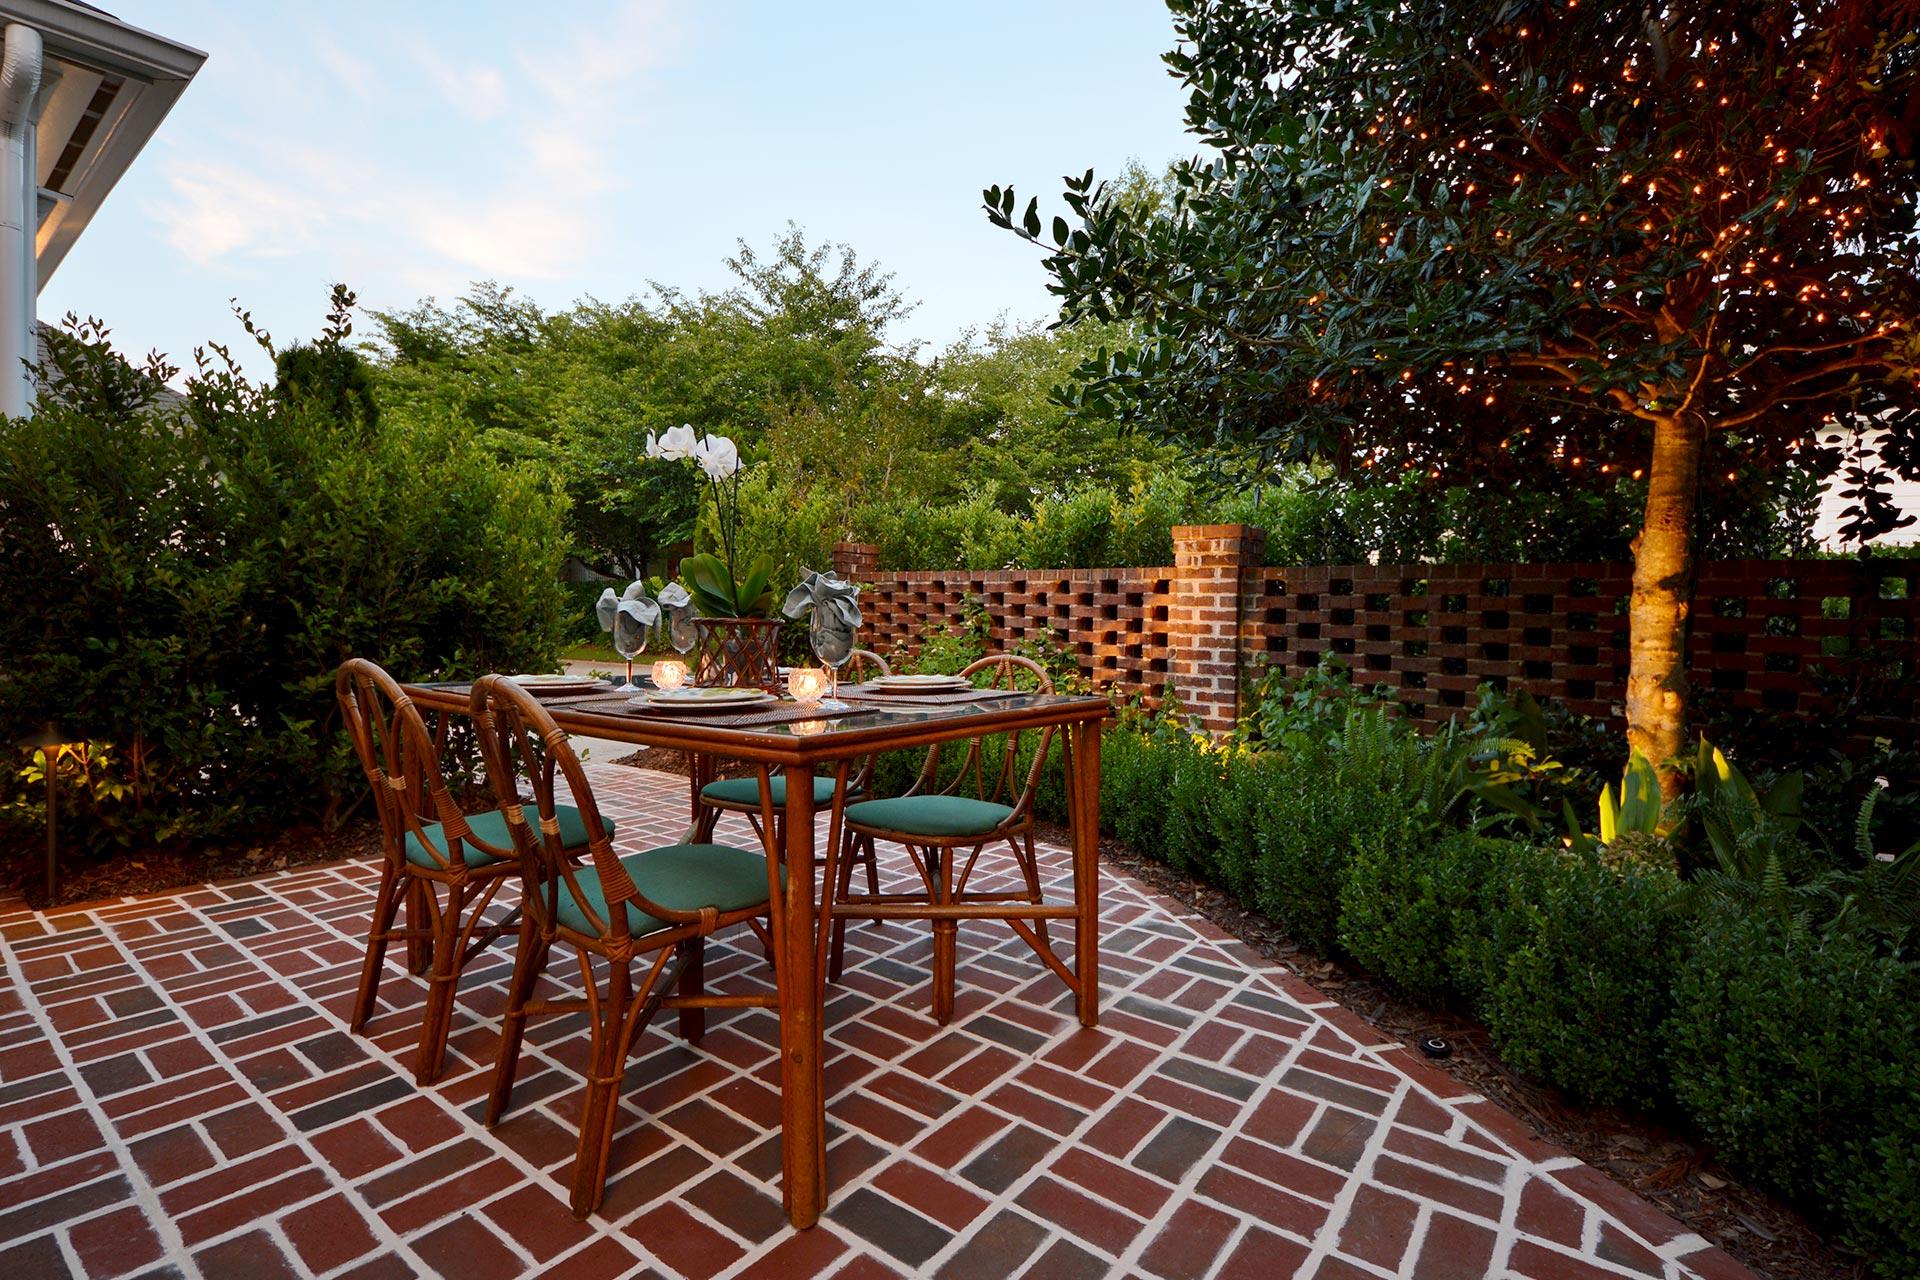 Outdoor Dining Paver Patio